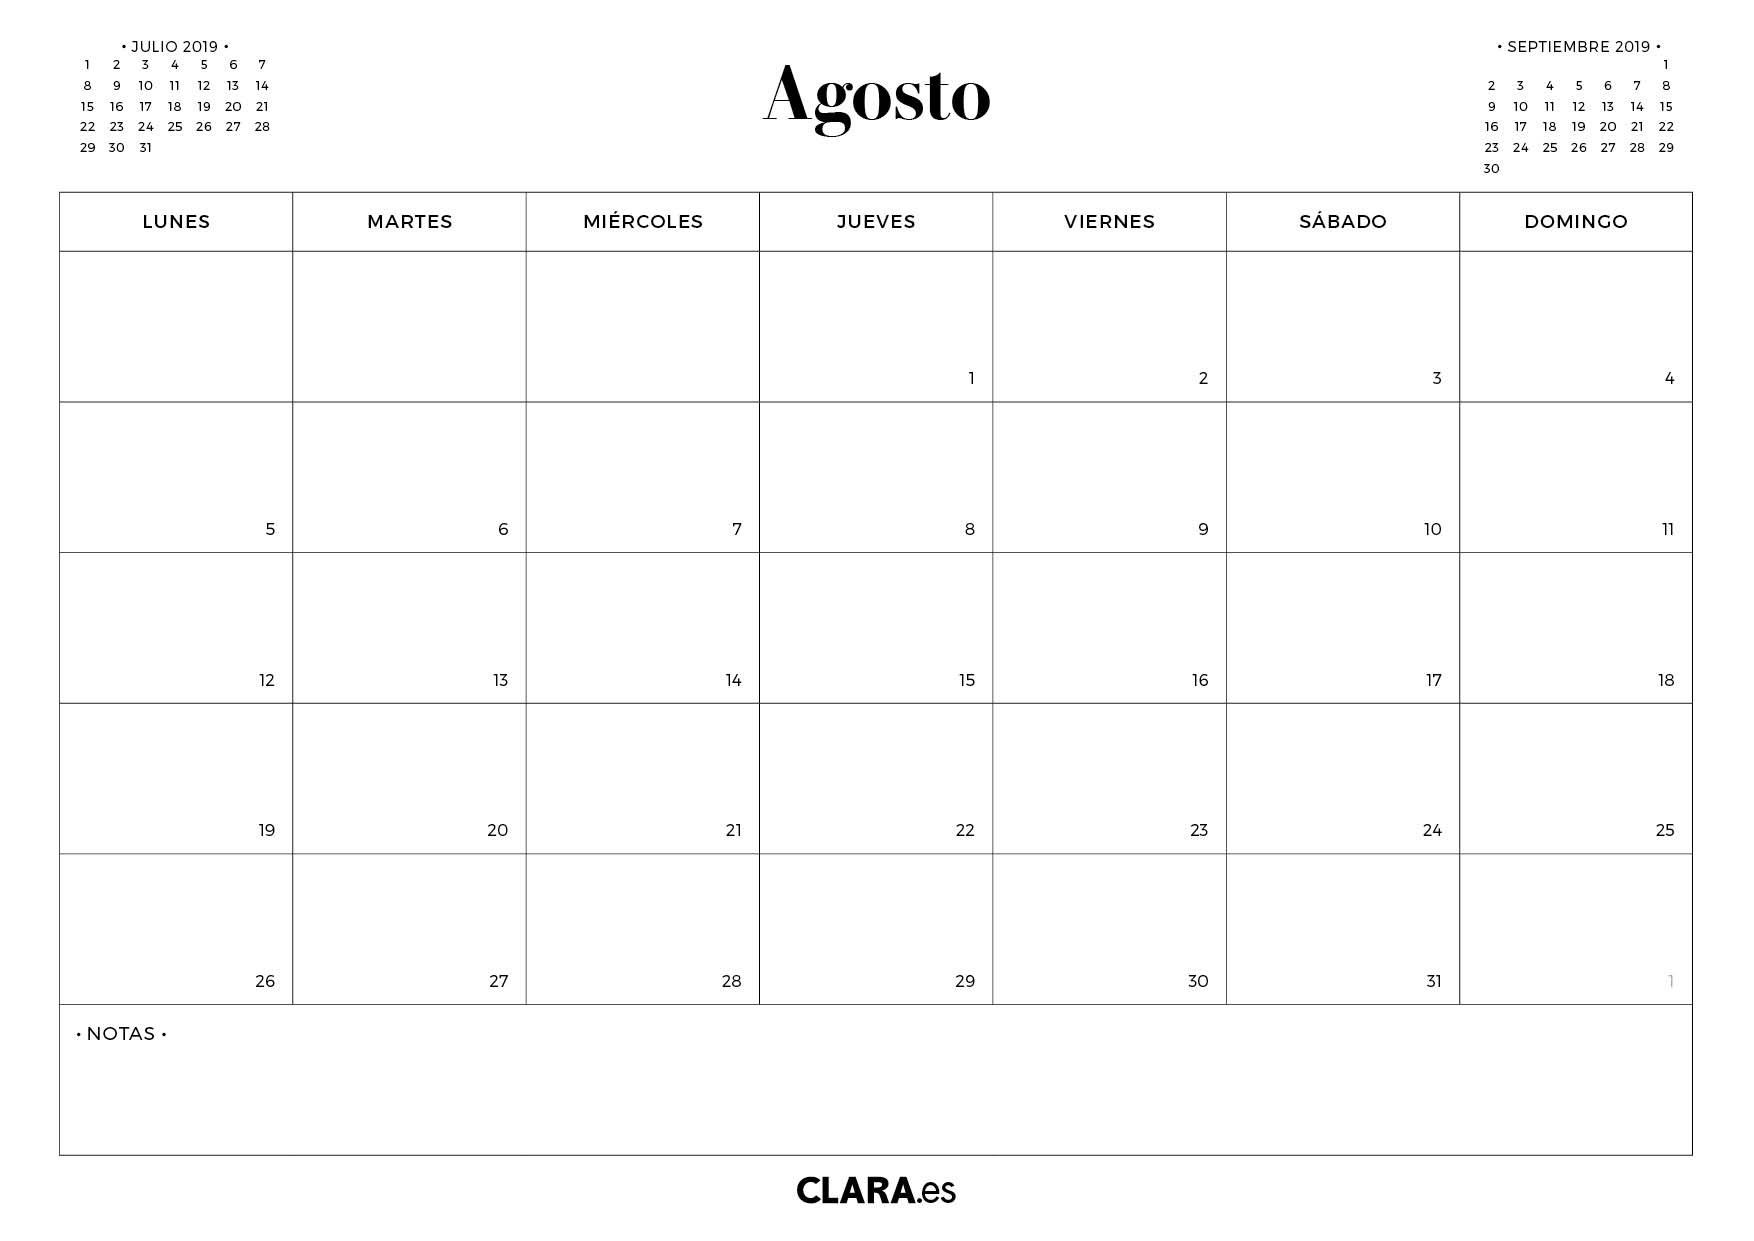 calendario agosto 2019 para imprimir gratis 5d62edae